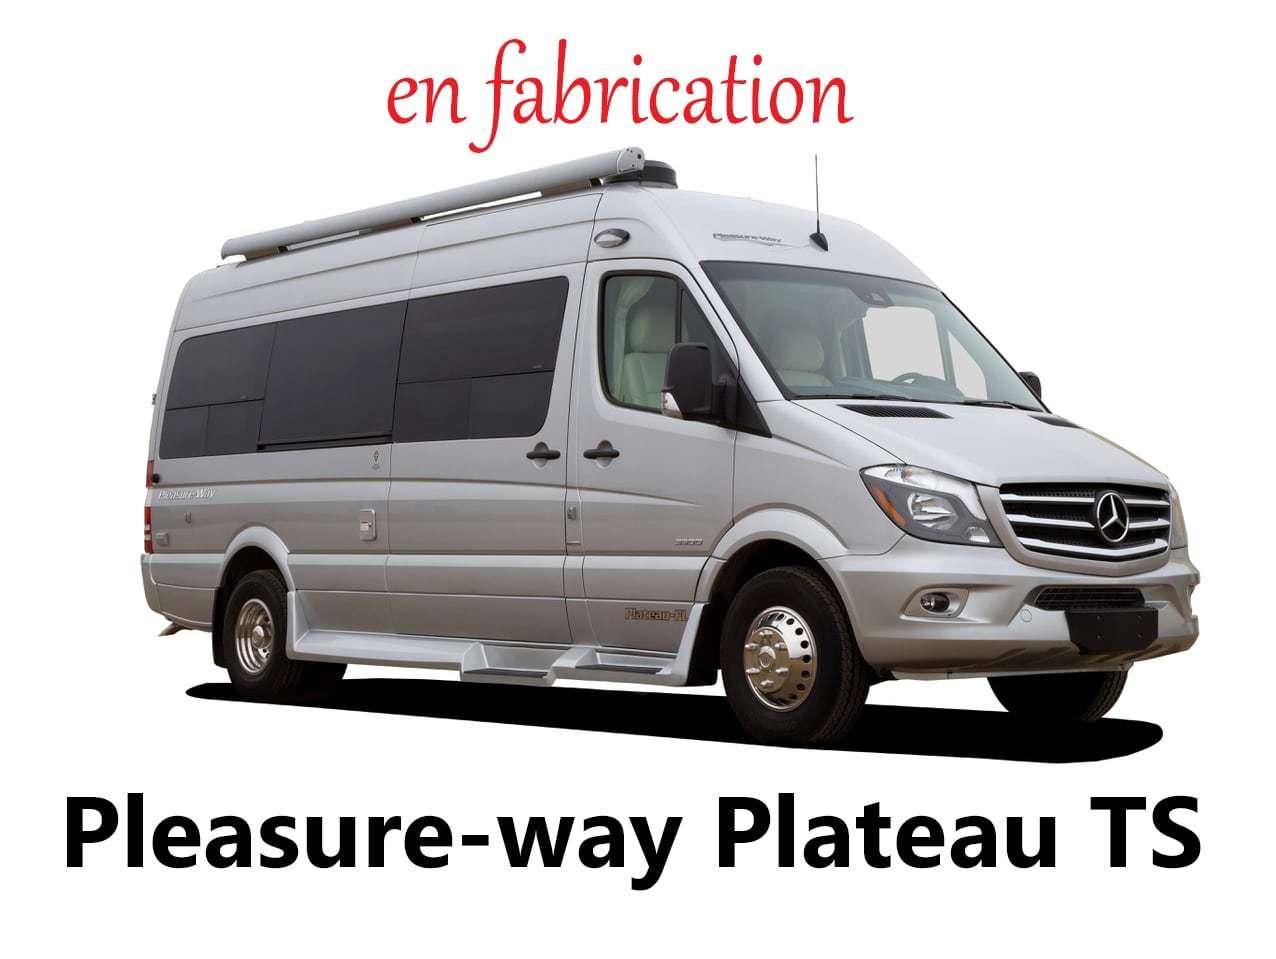 2020 PLEASURE-WAY Plateau TS ! 2020 NEUF mercedes sprinter Classe B